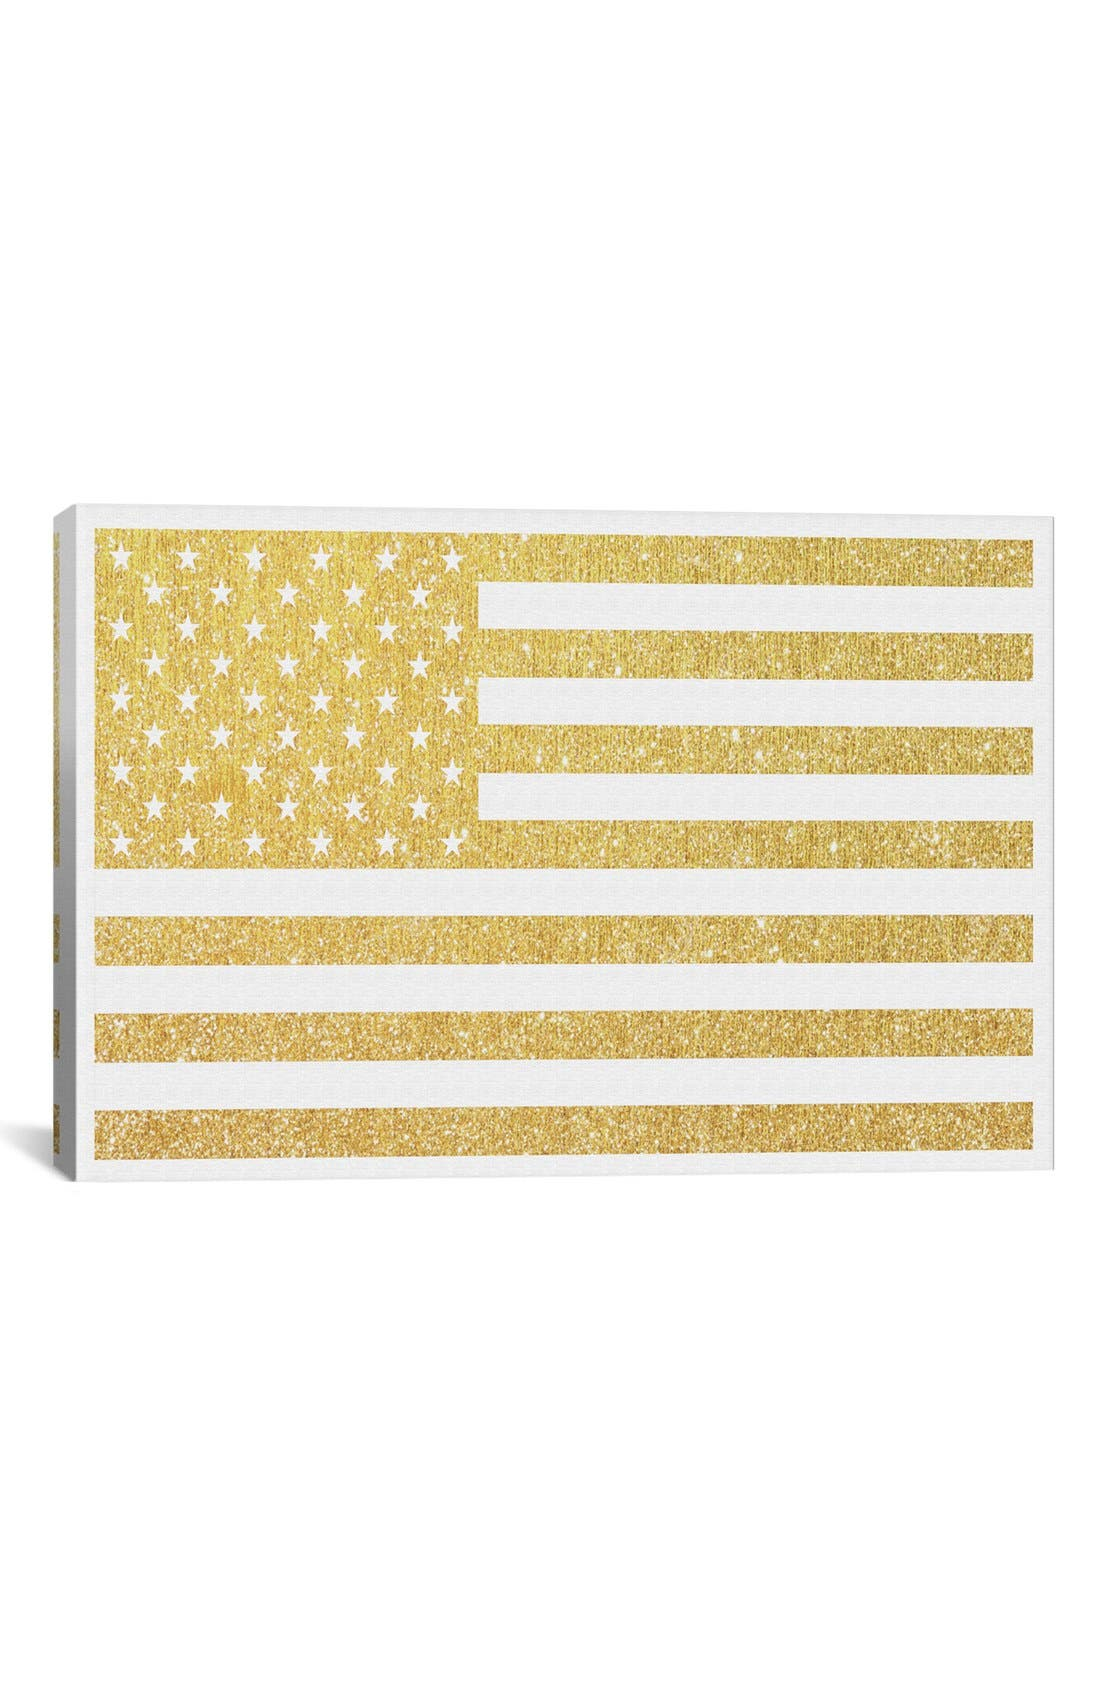 'Gold Flag III' Giclée Print Canvas Art,                             Main thumbnail 1, color,                             Metallic Gold